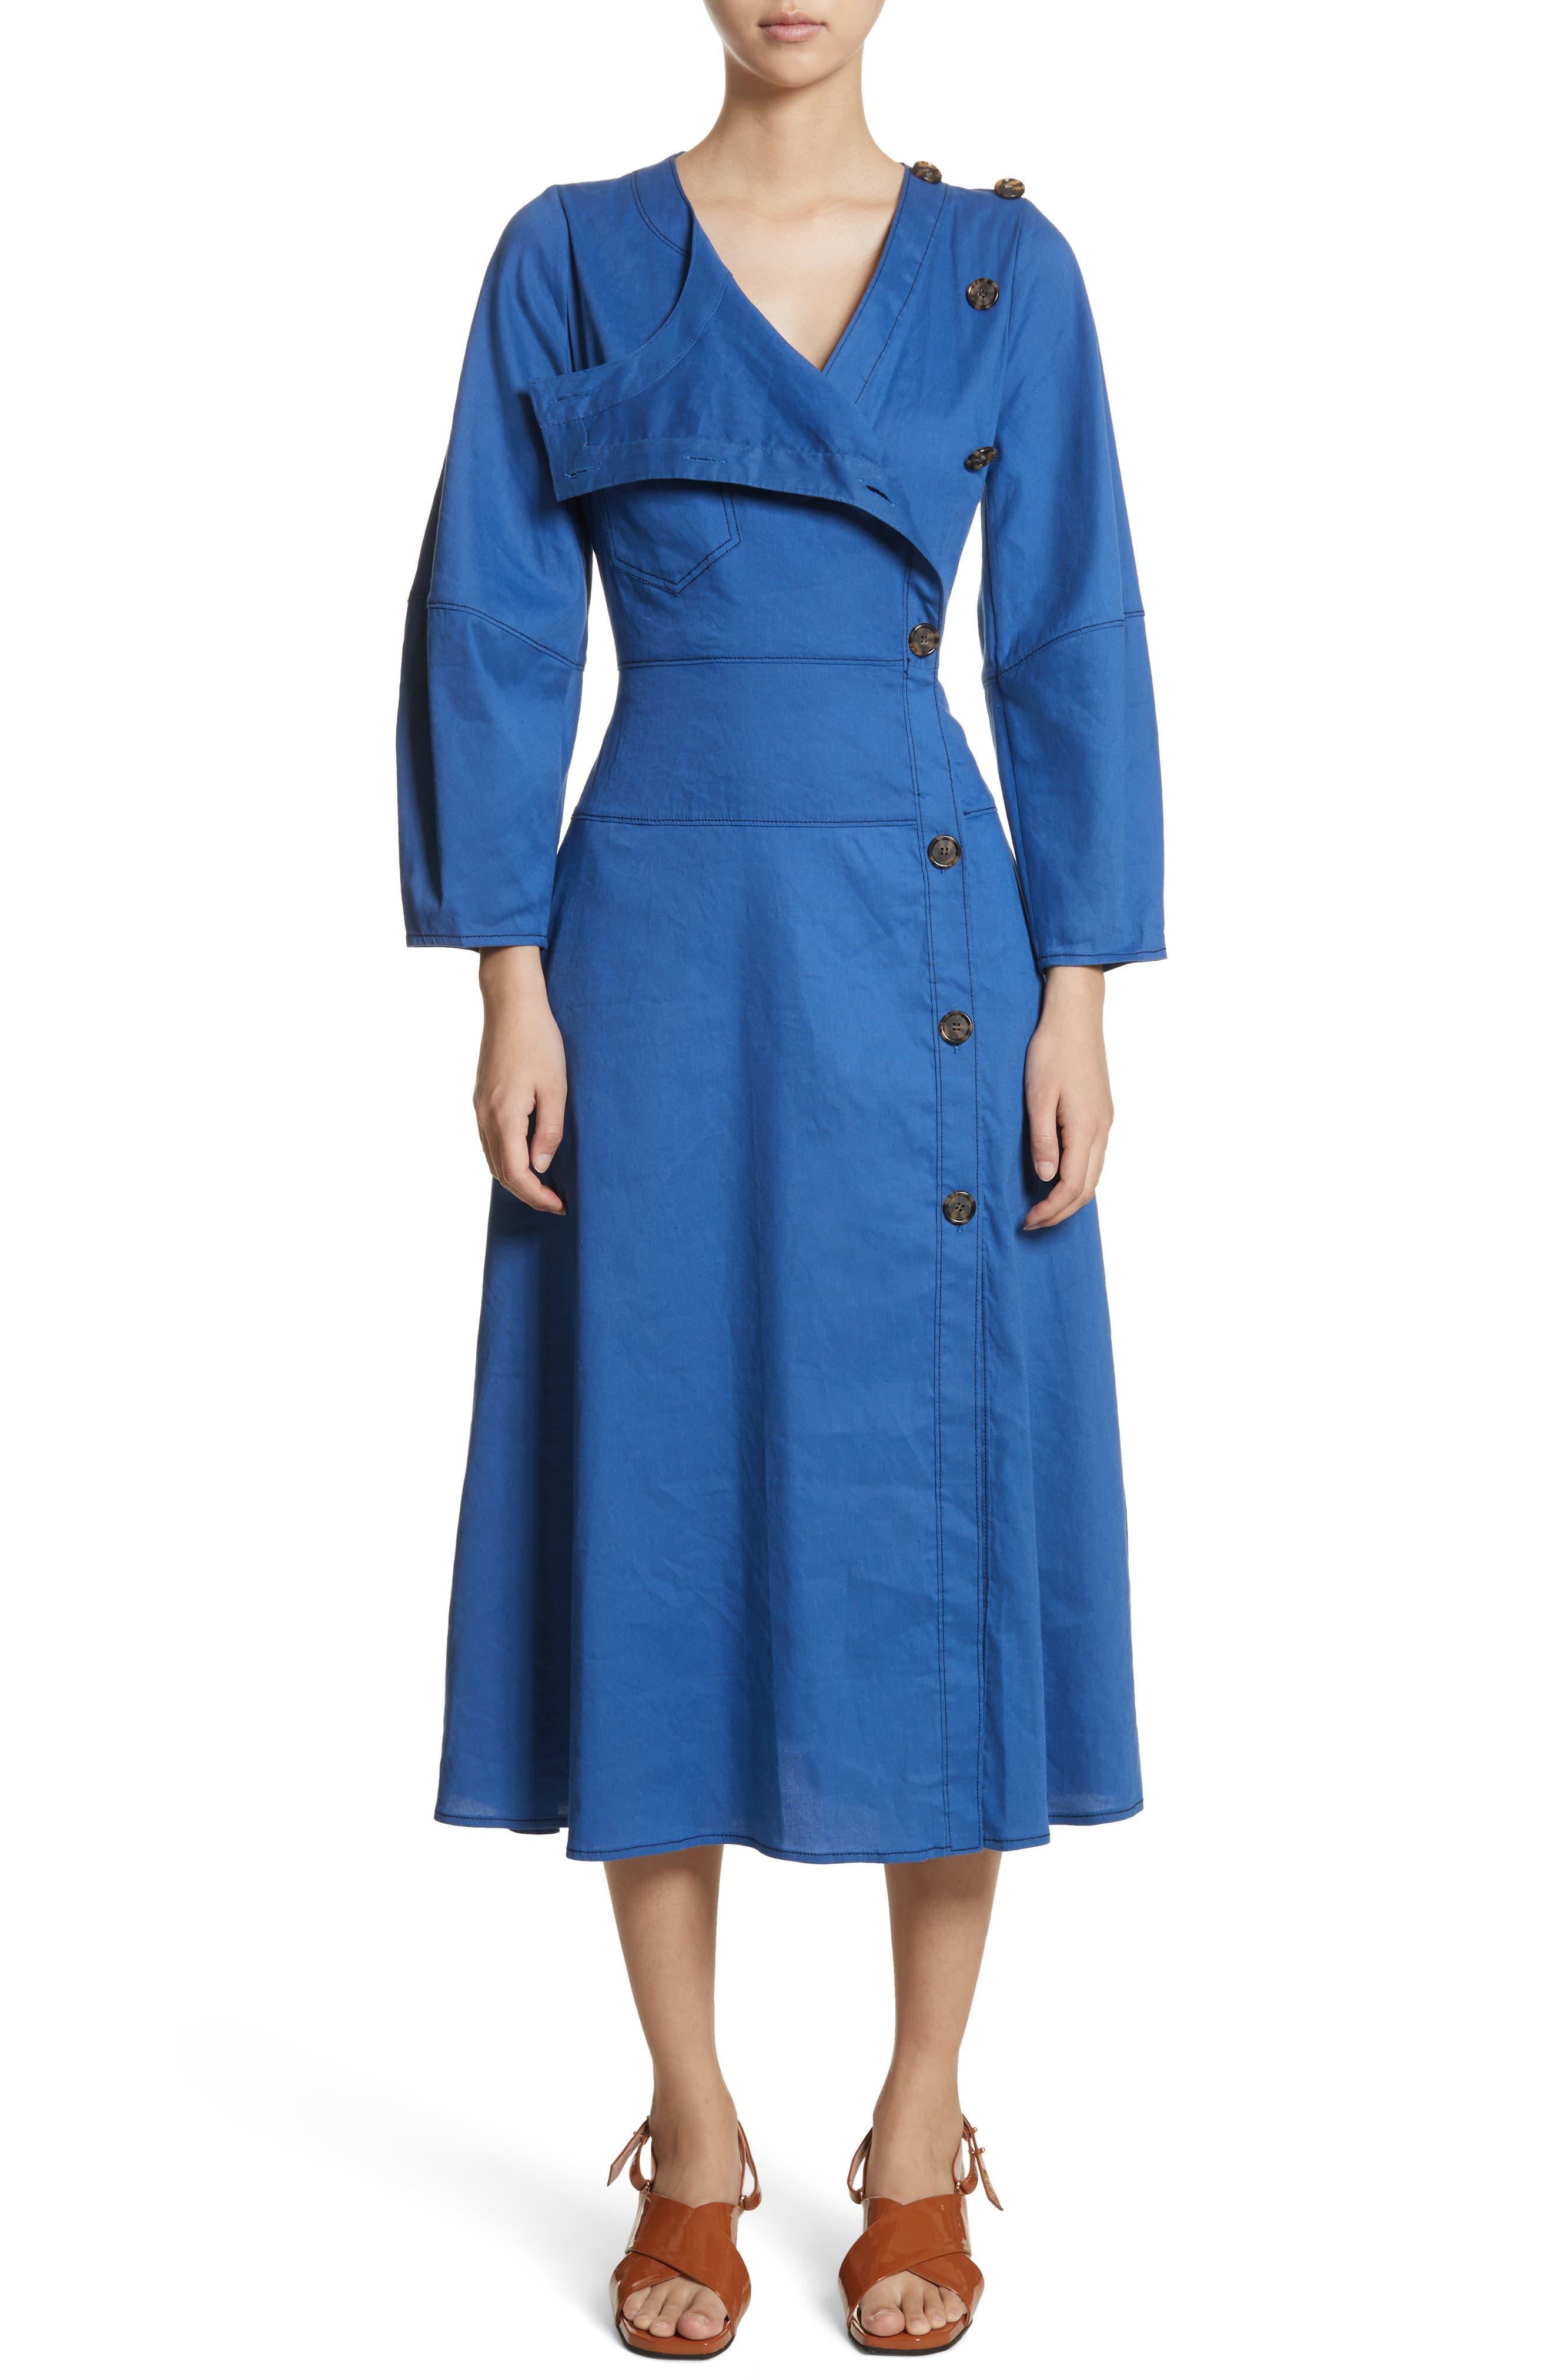 Michaela Linen Dress,                             Main thumbnail 1, color,                             Linen Blue